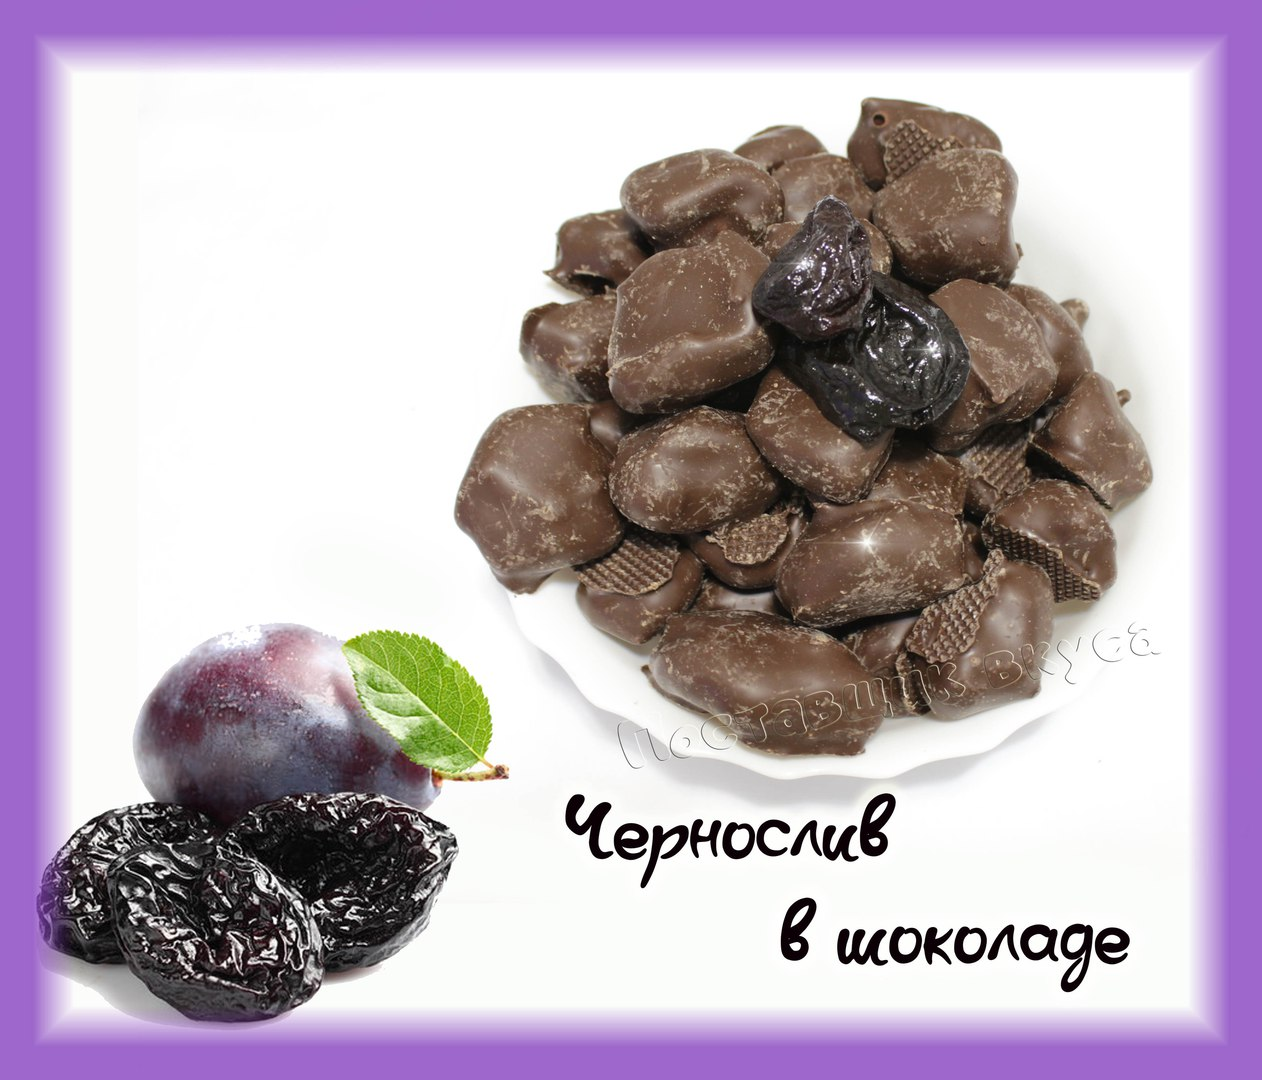 Чернослив в шоколаде NEW 0.5 кг